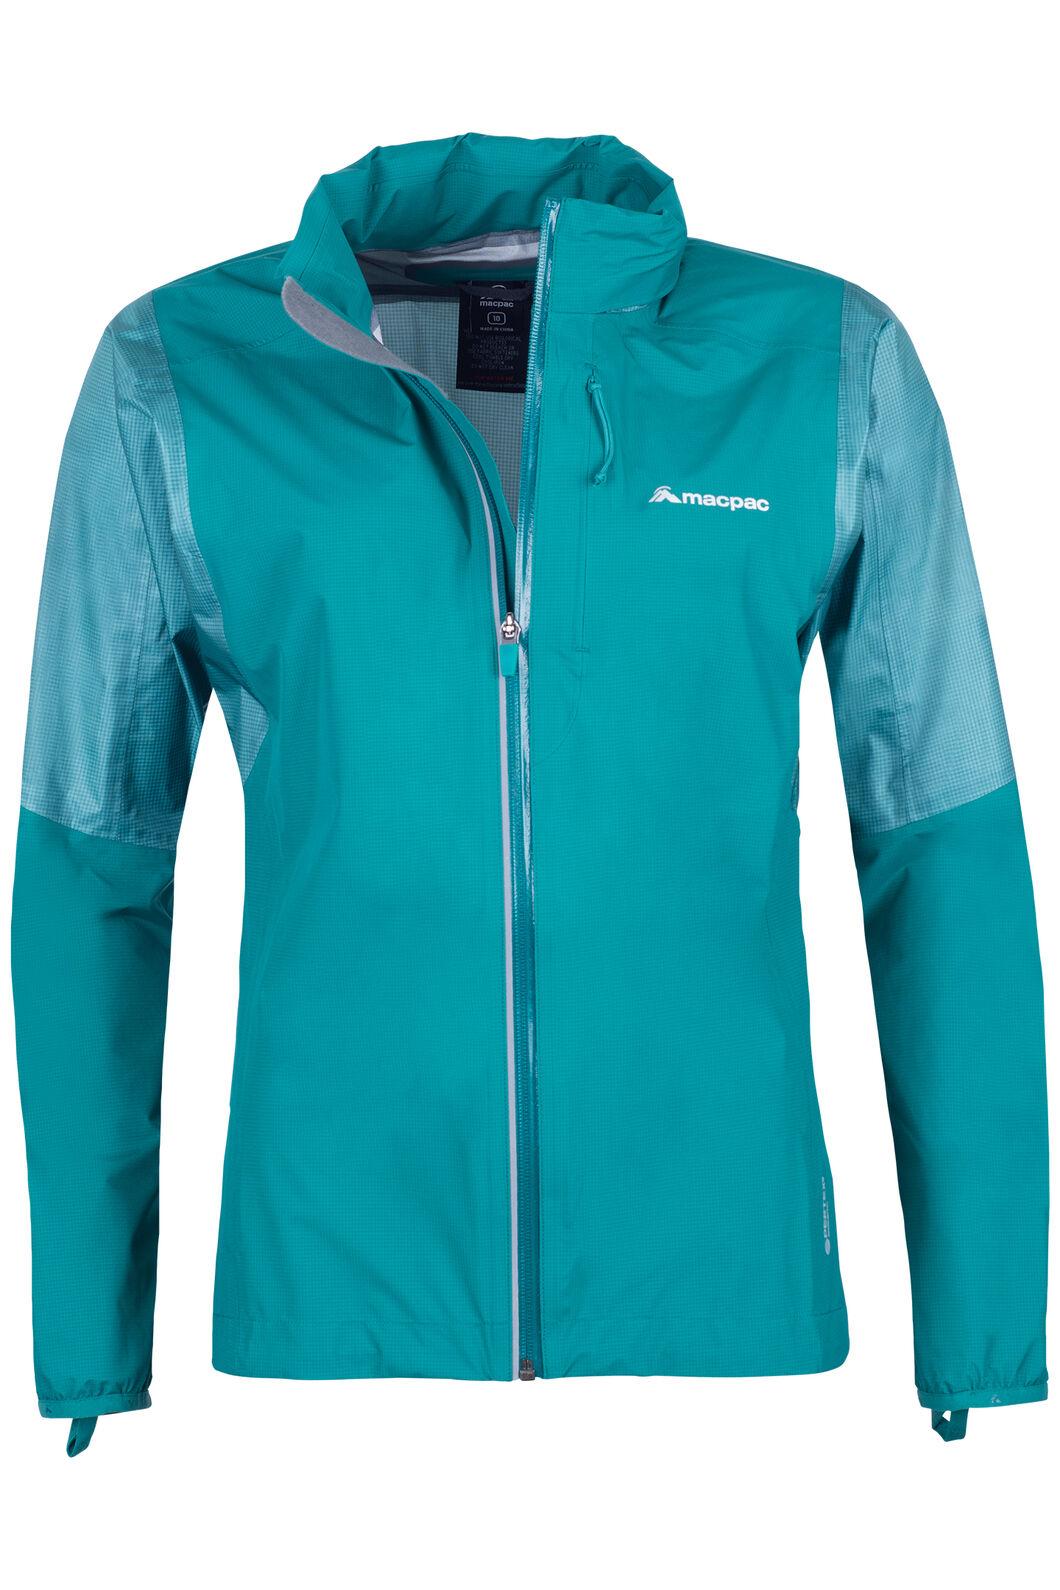 Transition Pertex Shield® Rain Jacket - Women's, Teal, hi-res